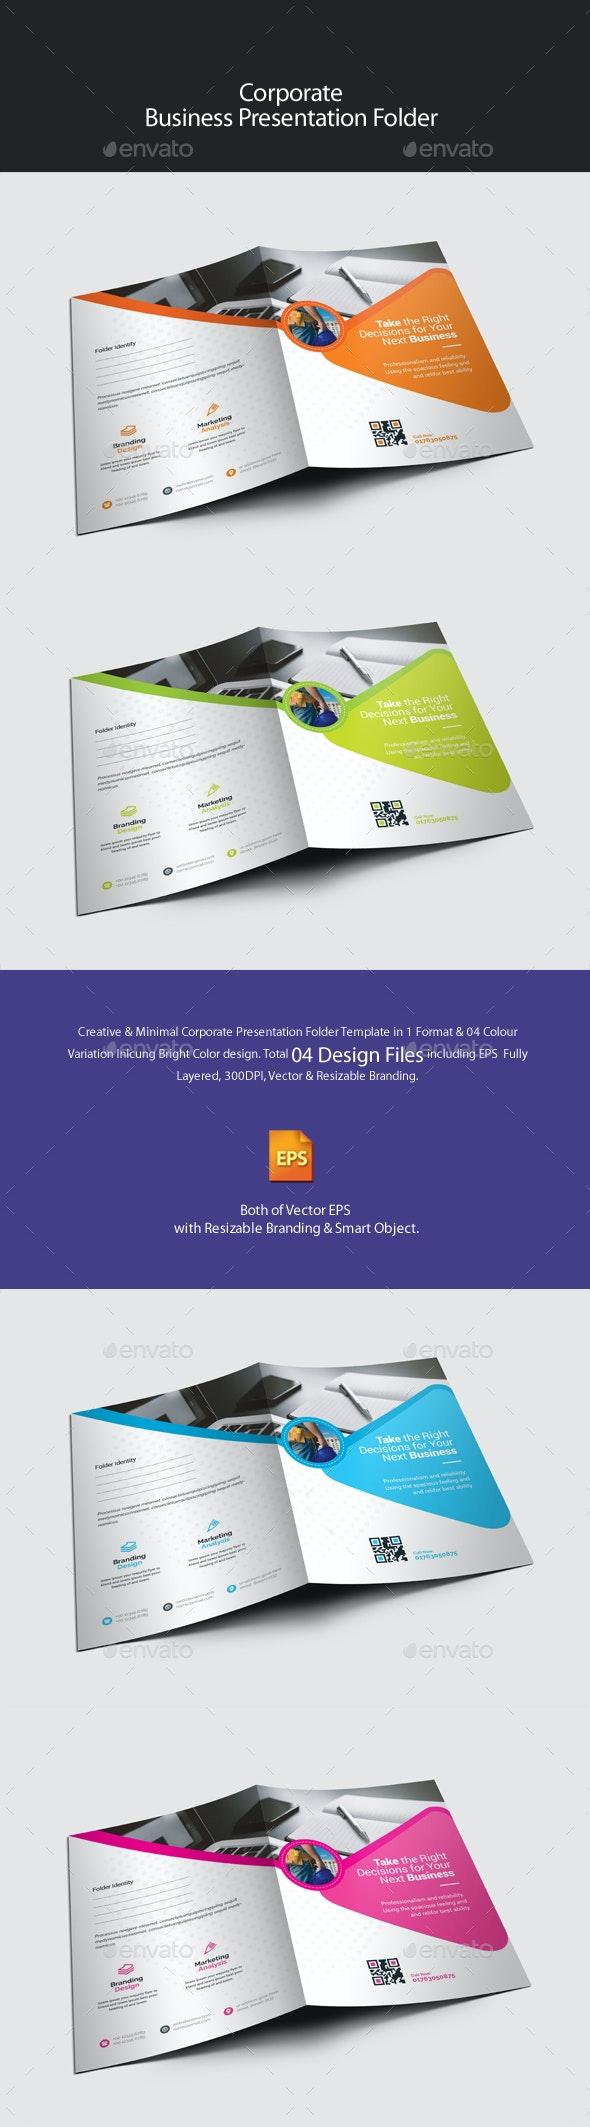 Corporate Presentation Folder - Stationery Print Templates